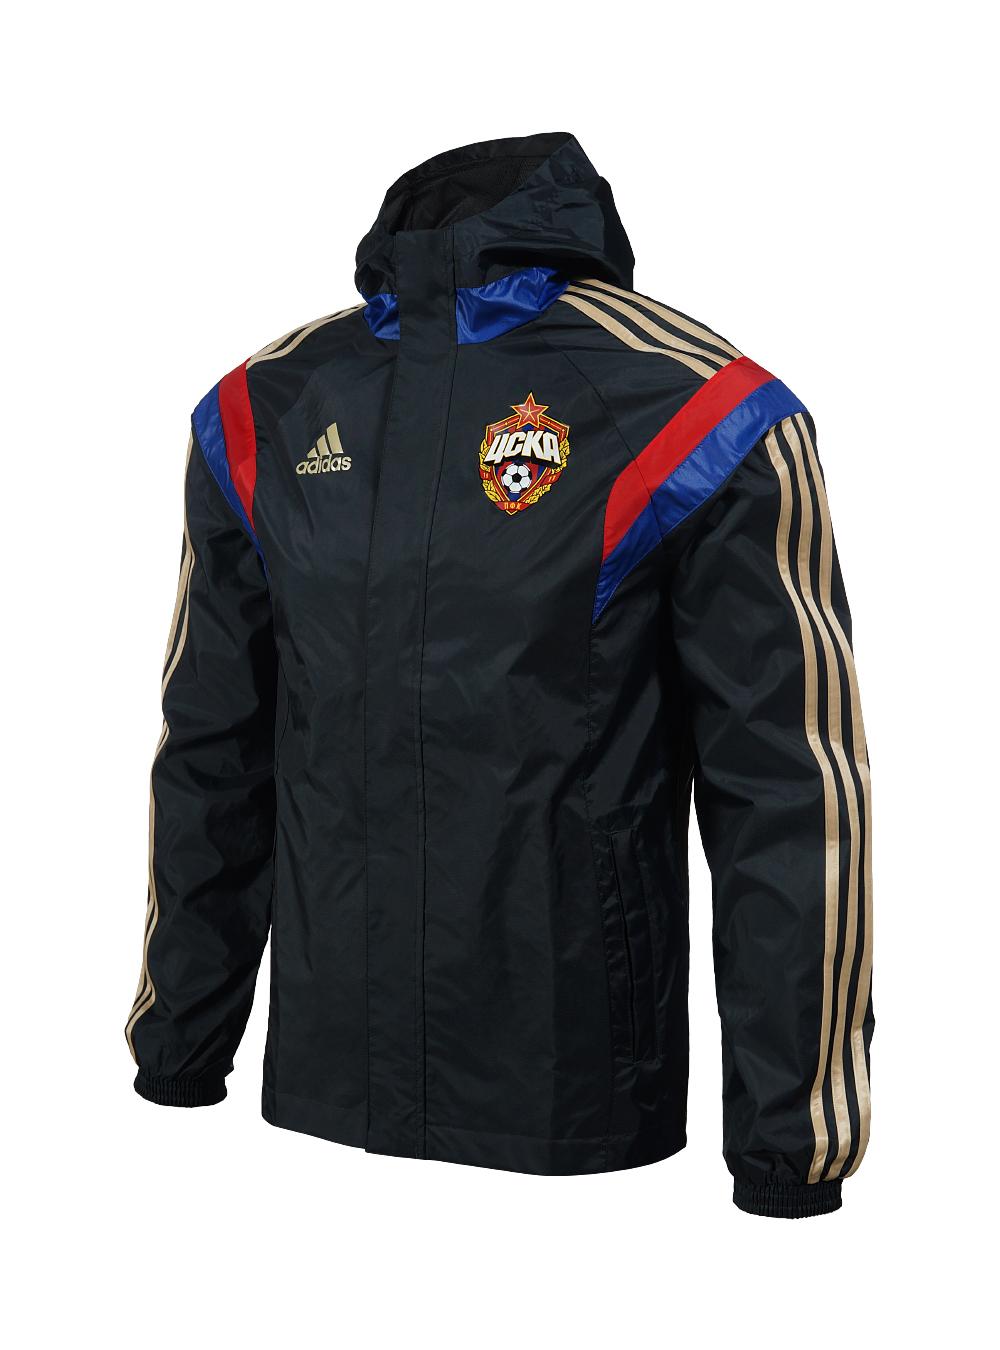 Куртка ветрозащитная (F85181) (S)Ликвидация<br>Куртка ветрозащитная (F85181)<br>